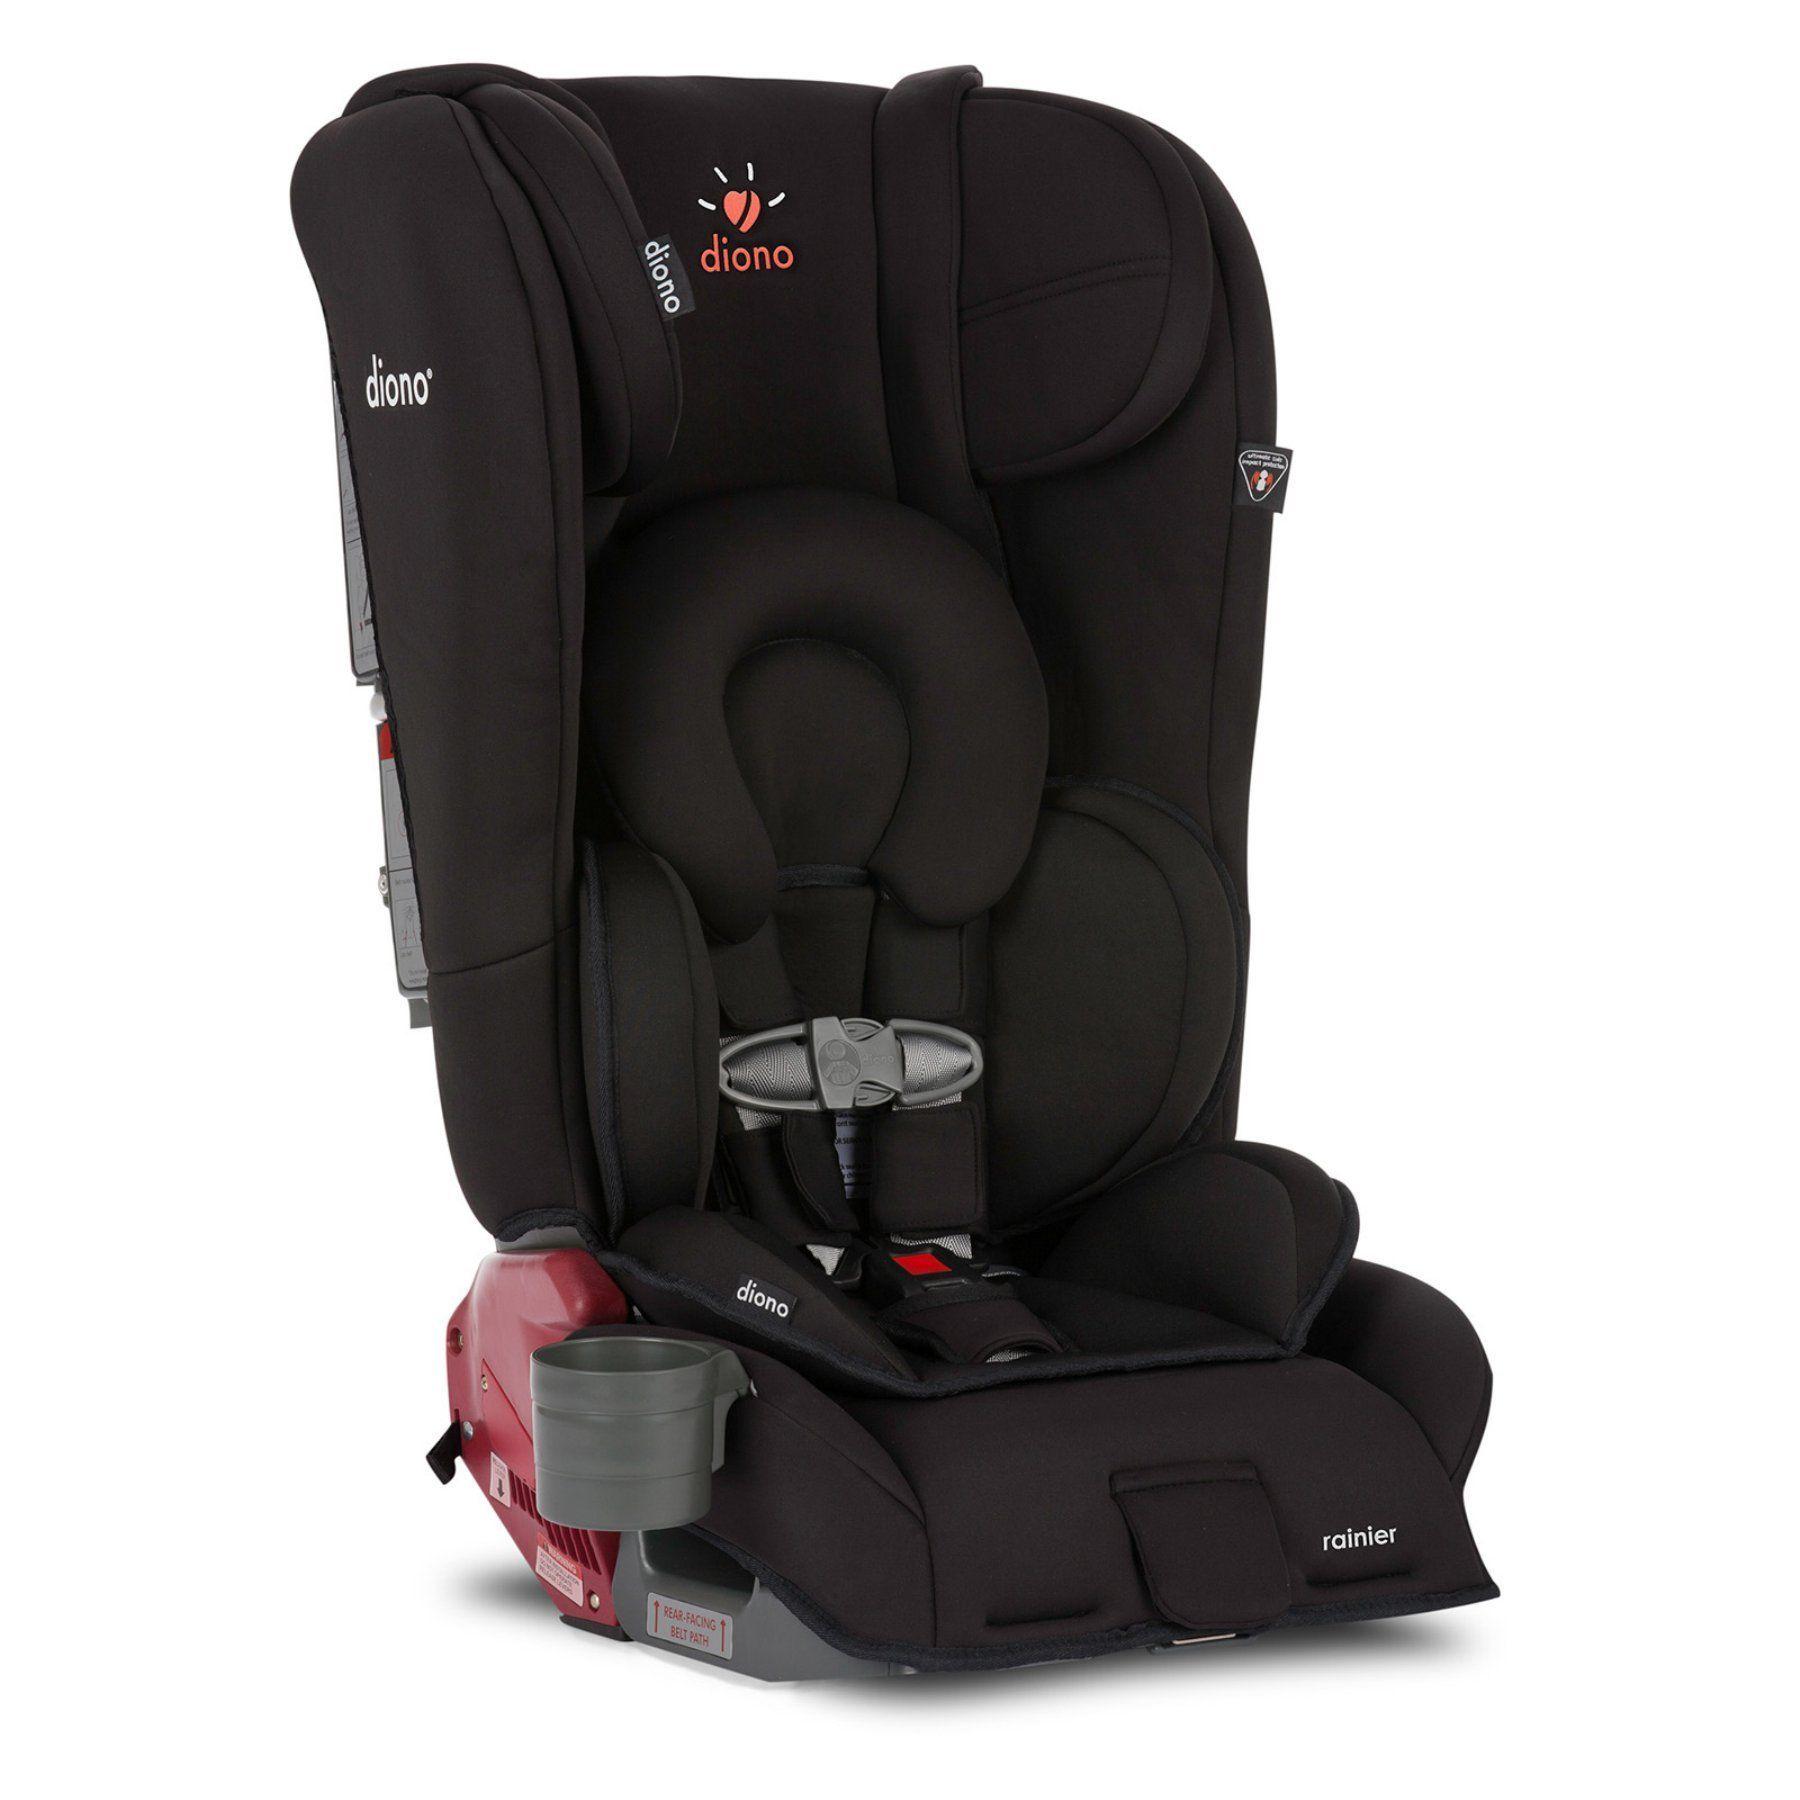 Diono Rainier Convertible Car Seat Midnight 16015